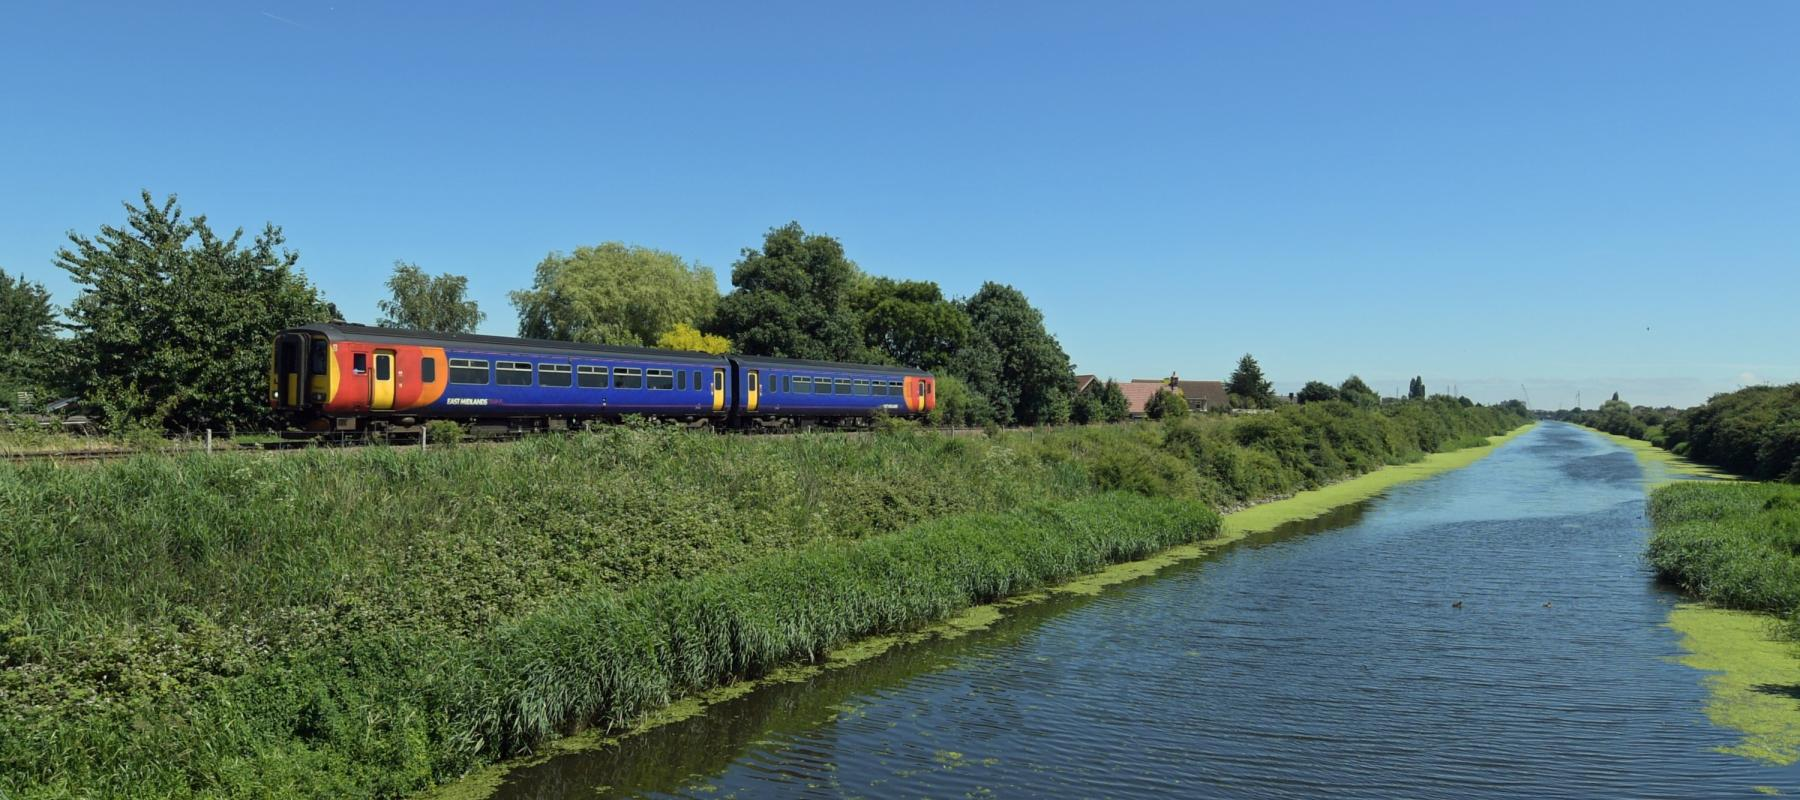 East Midlands train travelling along the Poacher line